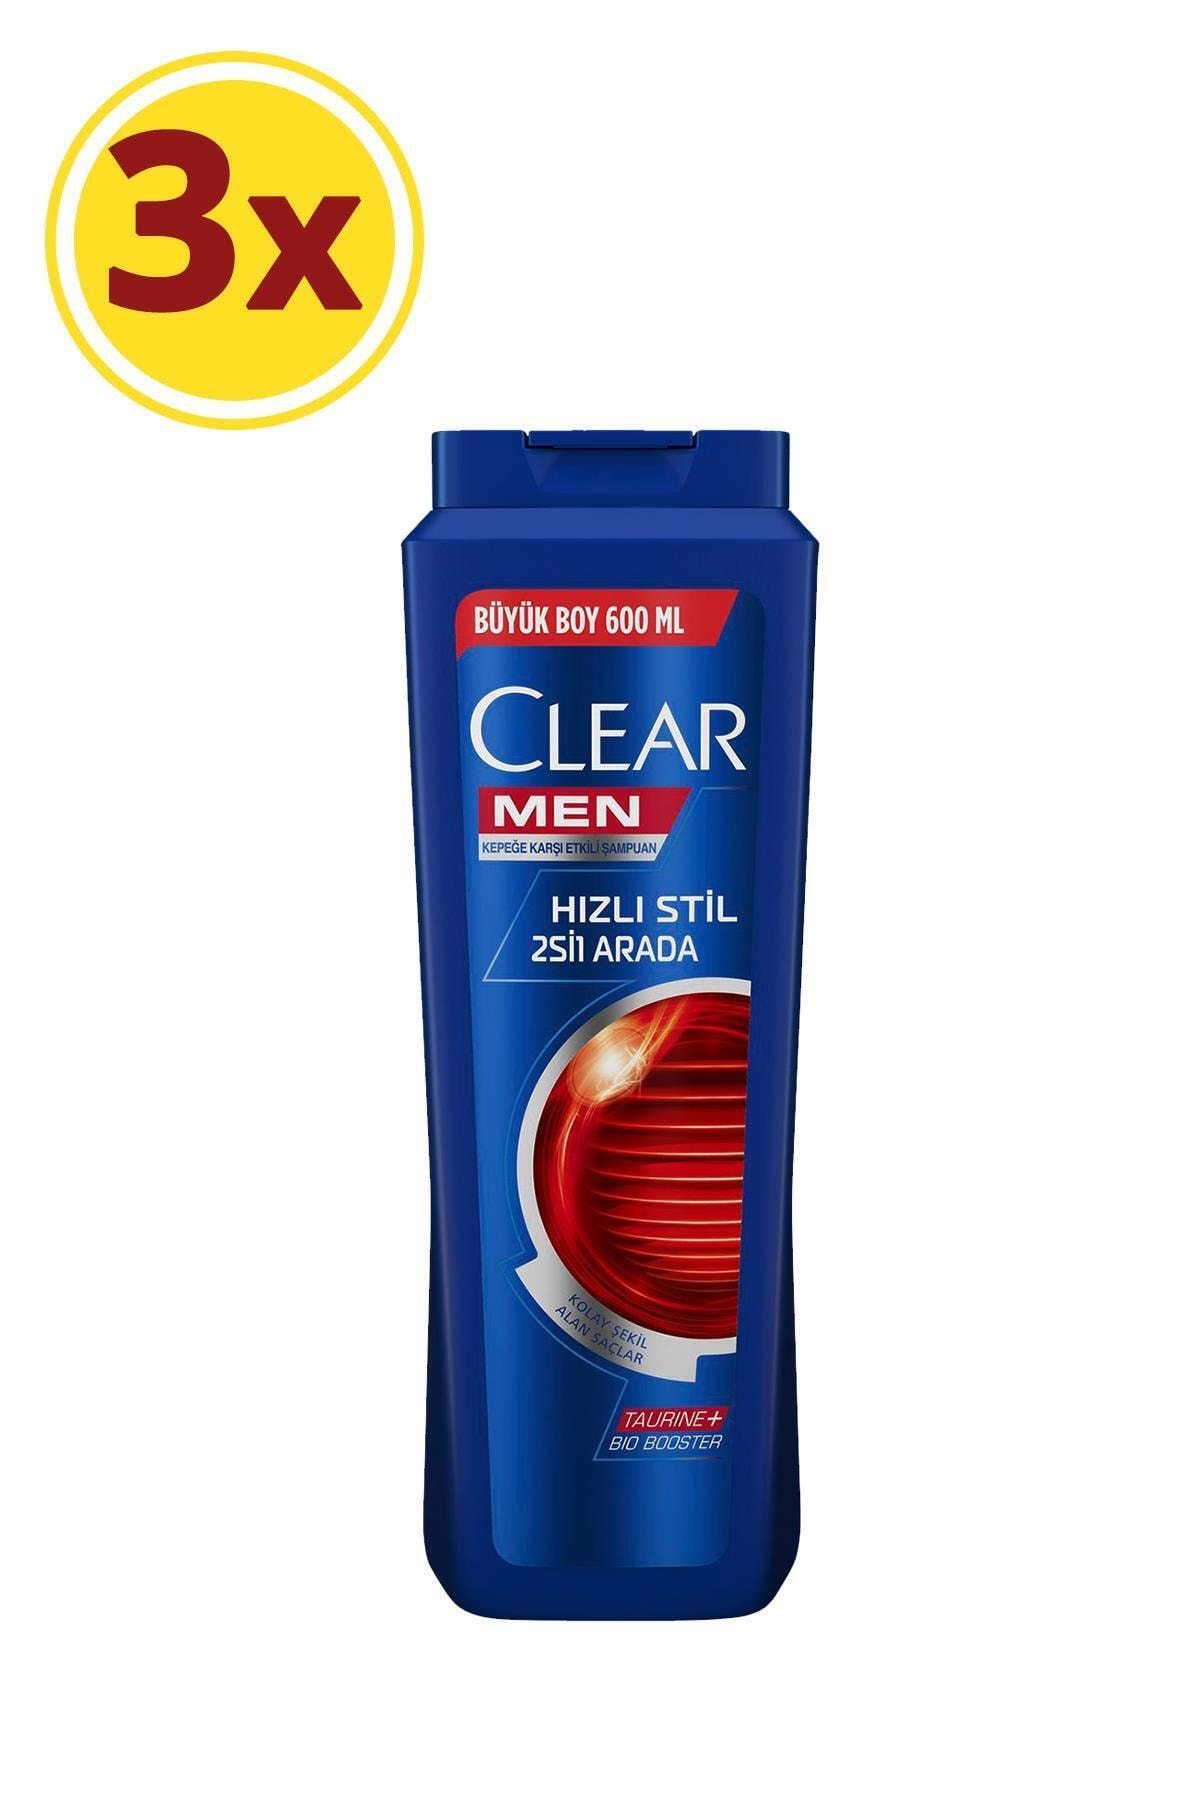 Clear Men Hızlı Stil 2si1 Arada Şampuan 600ml X3 1